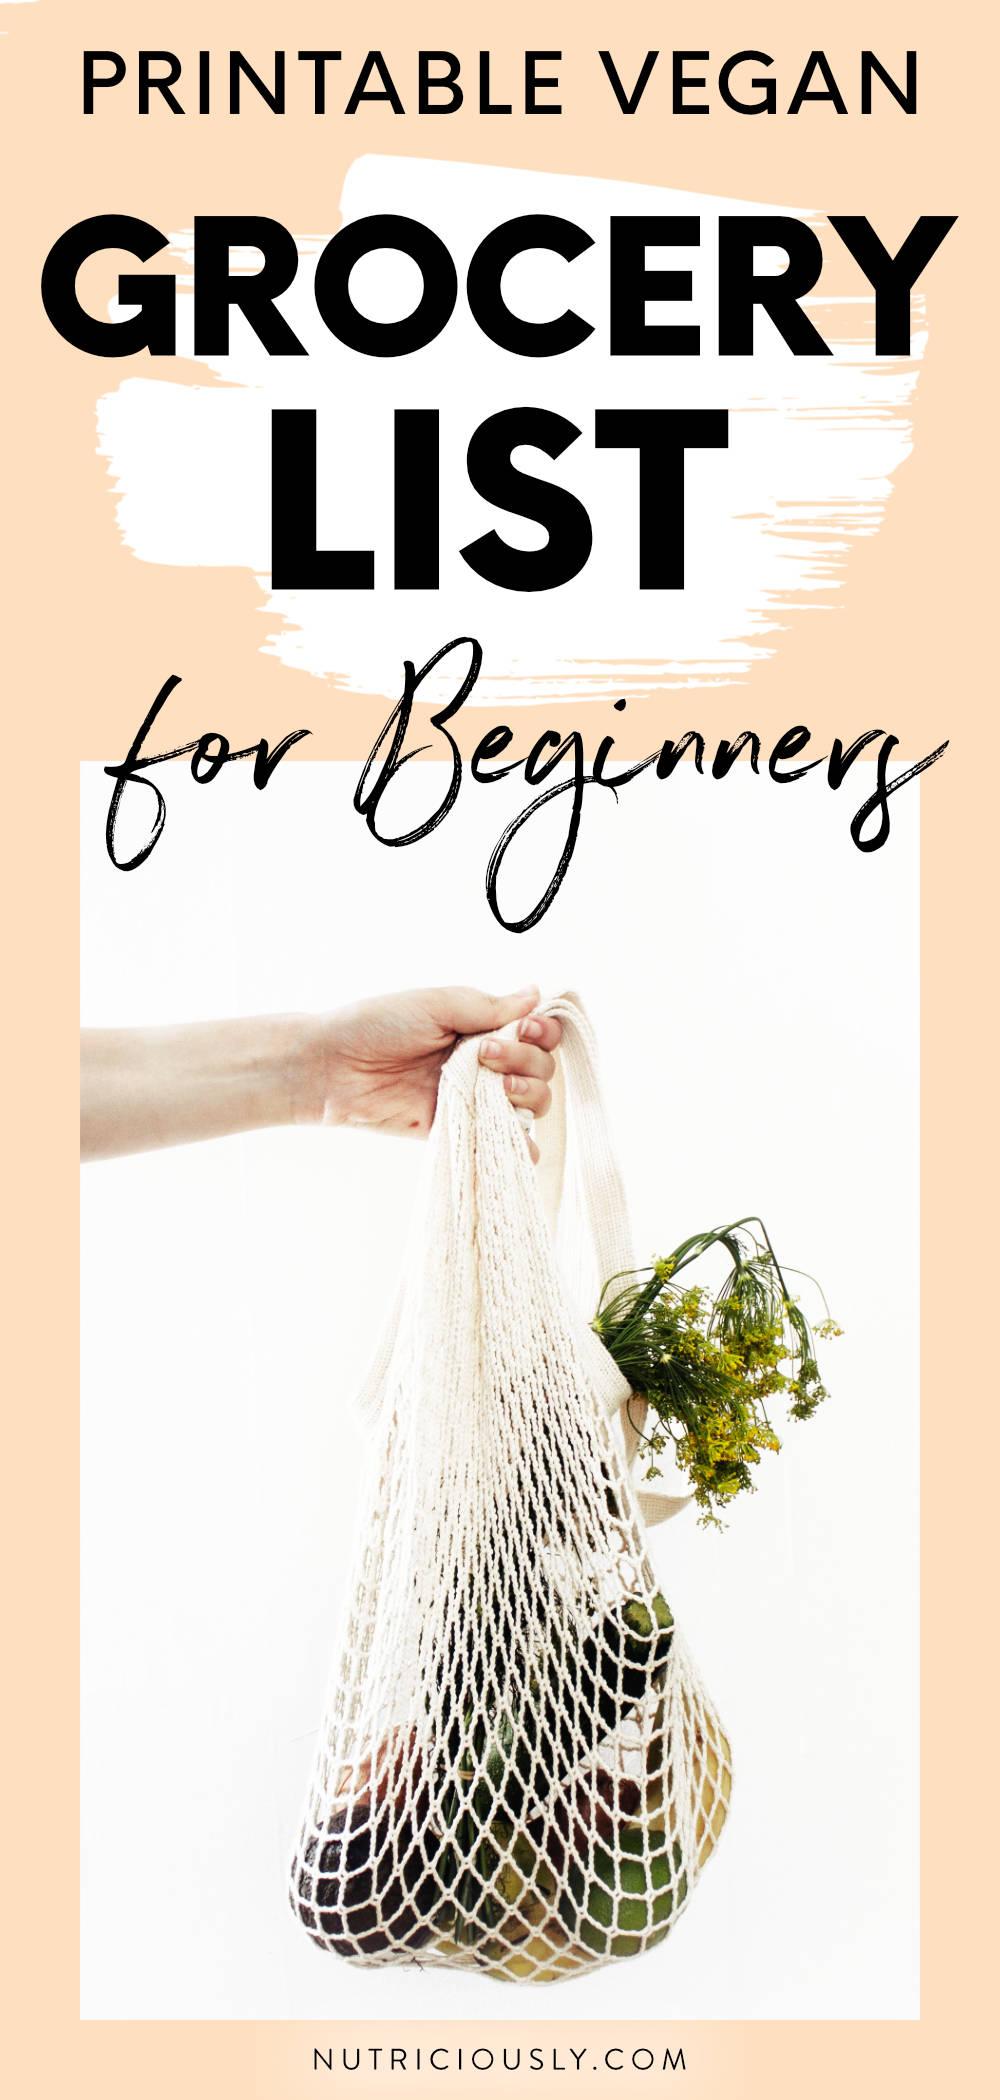 Ultimate Vegan Grocery List for Beginners (Printable PDF